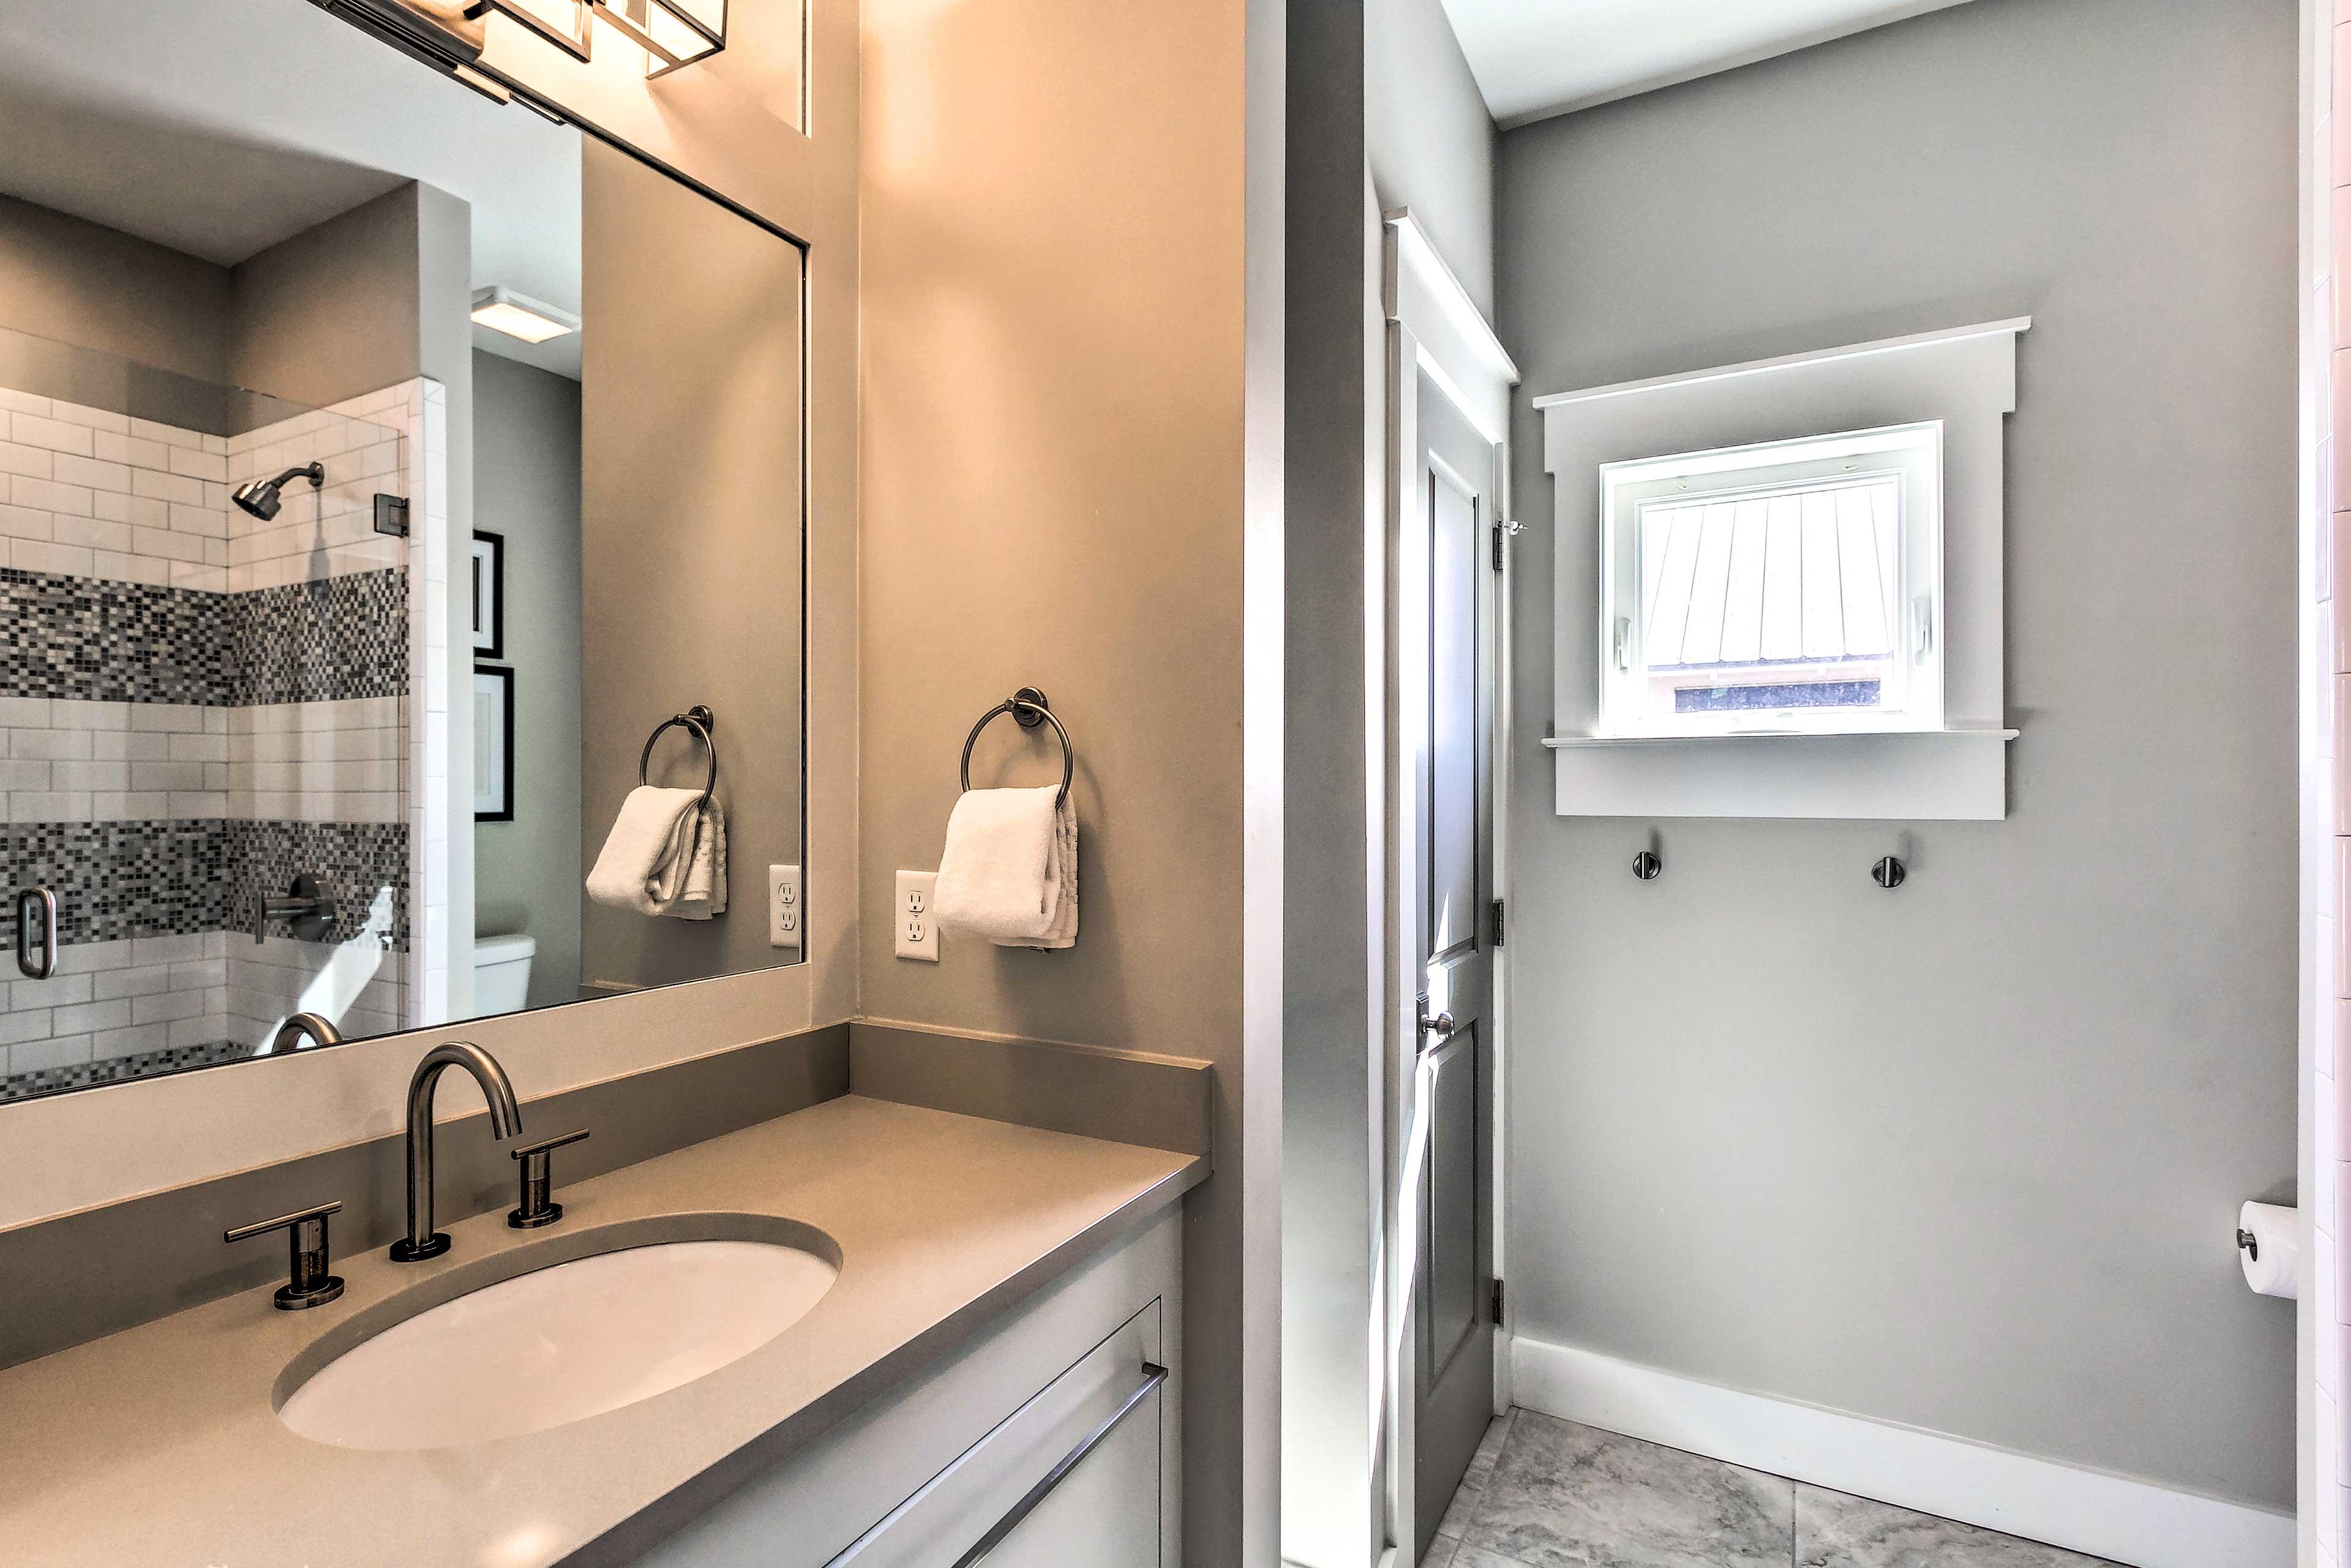 The home provides 5 full bathrooms & 1 half bath.